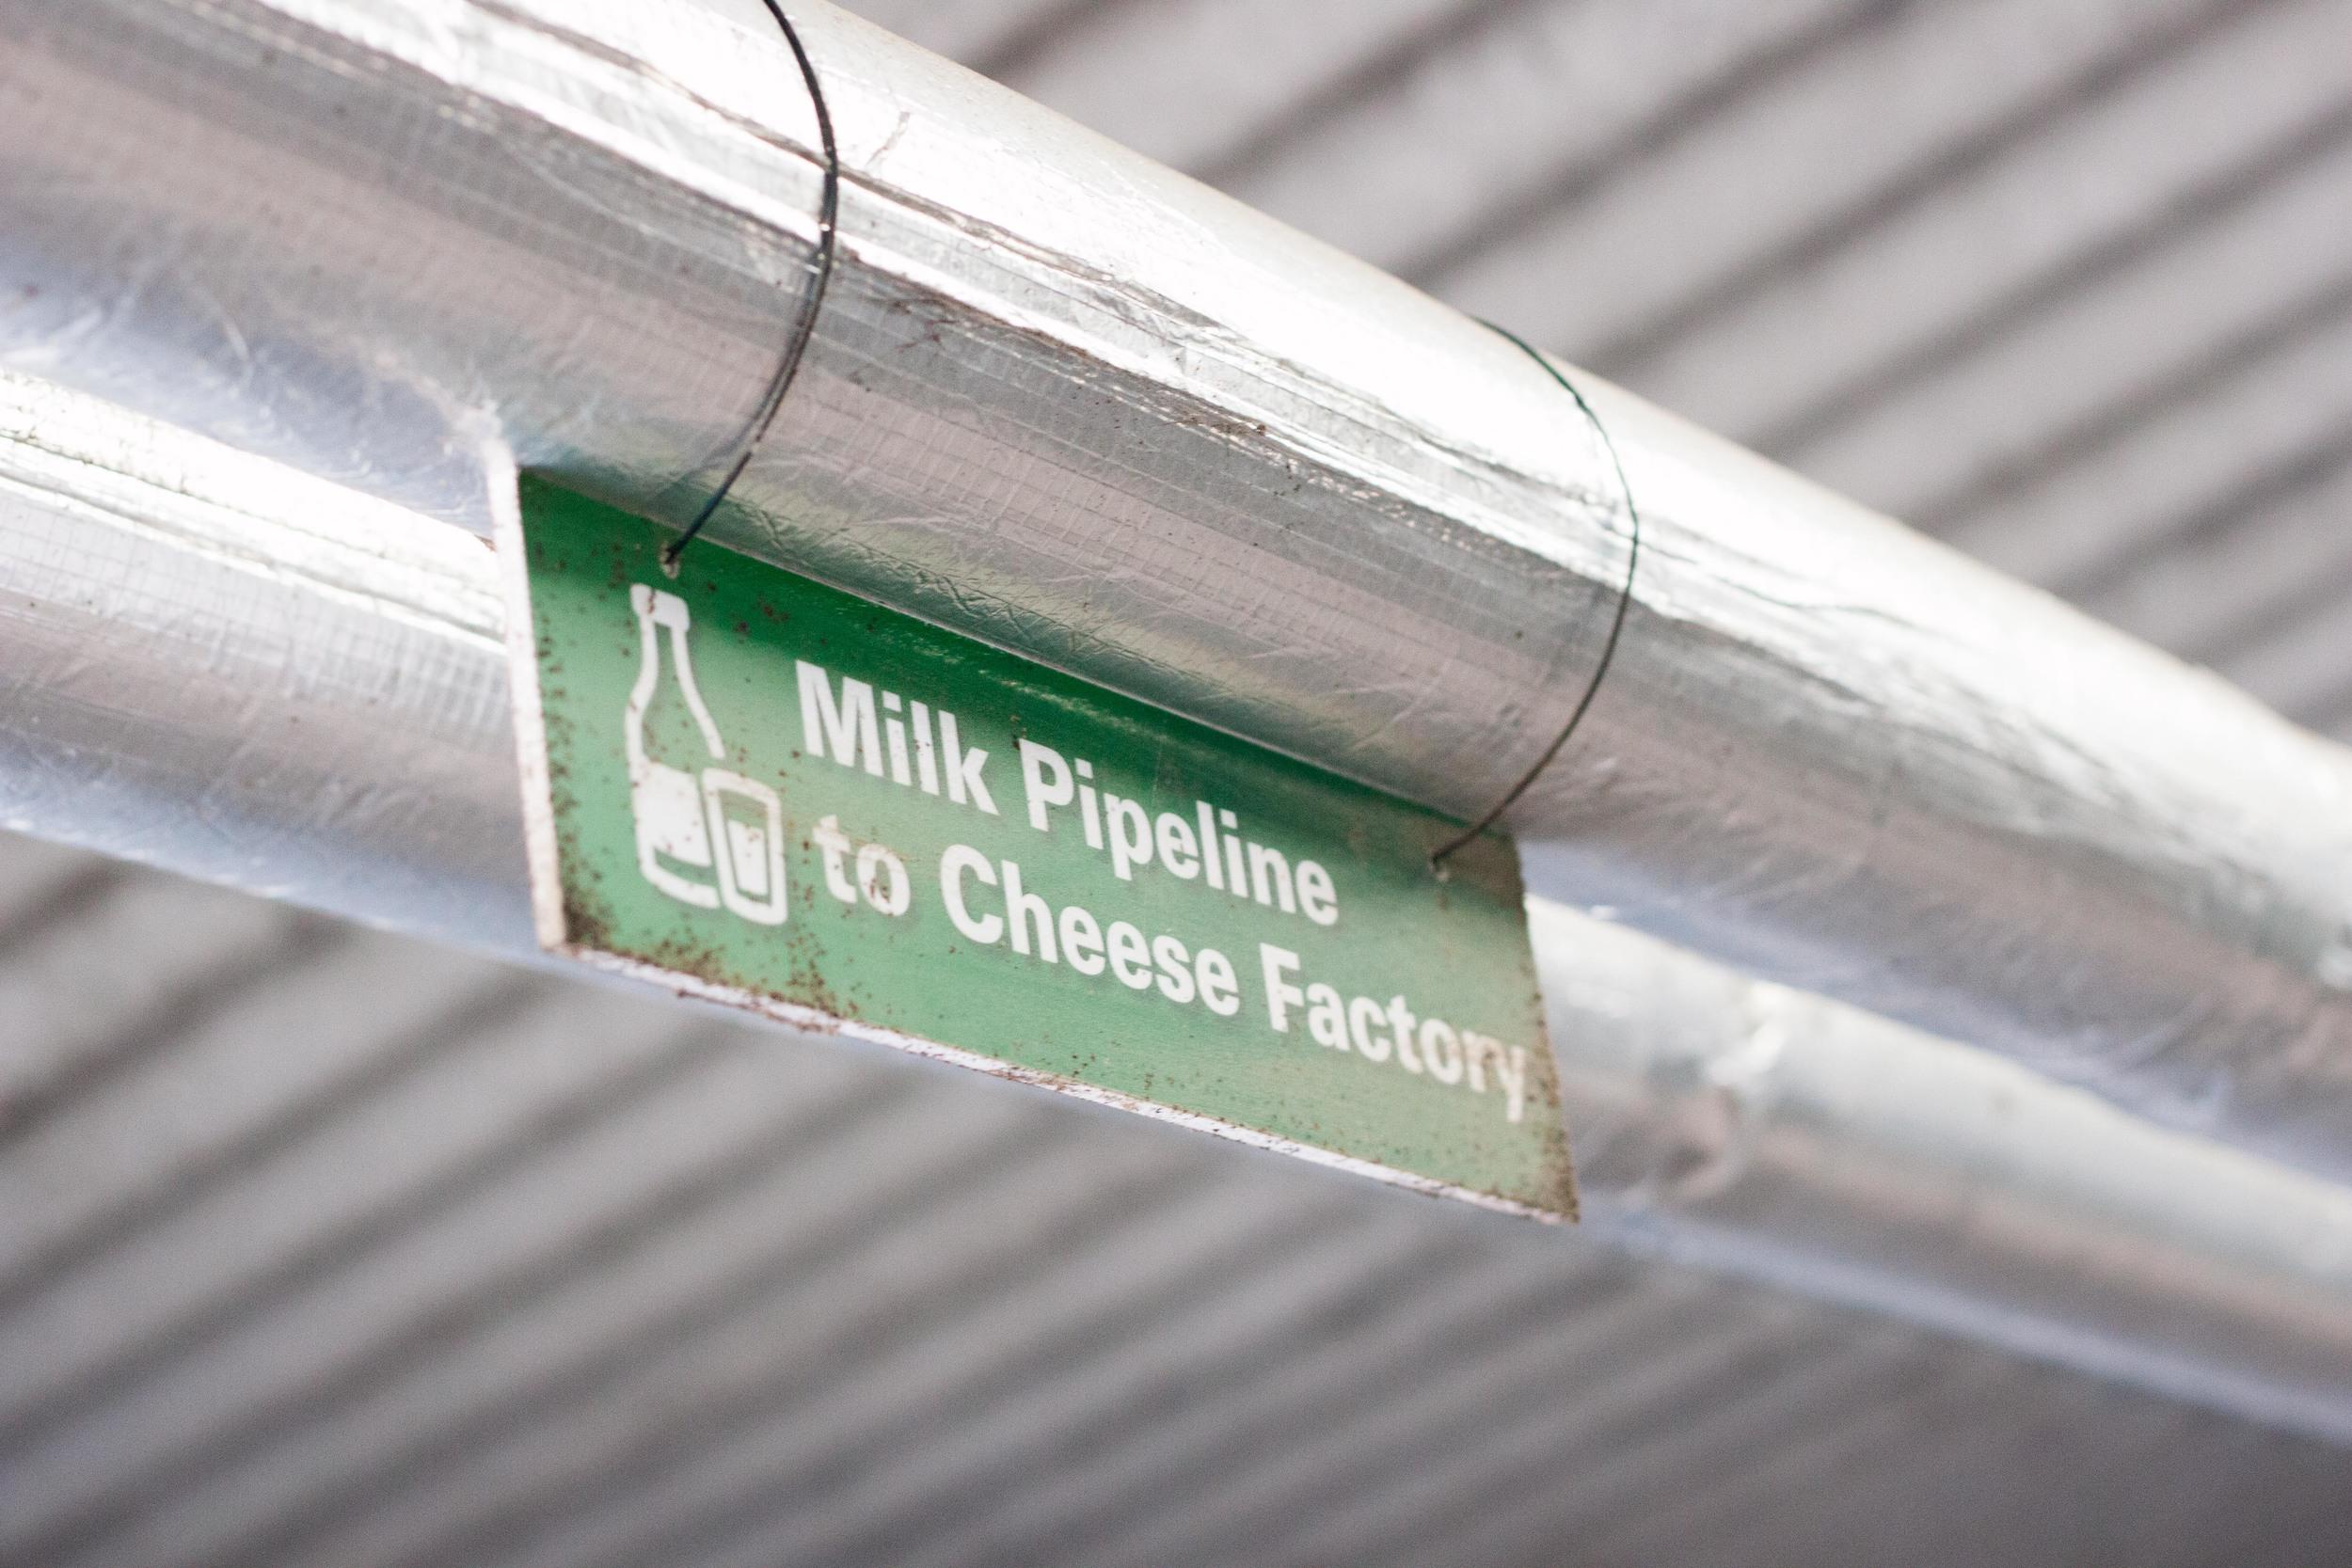 trethowans_dairy_pipeline